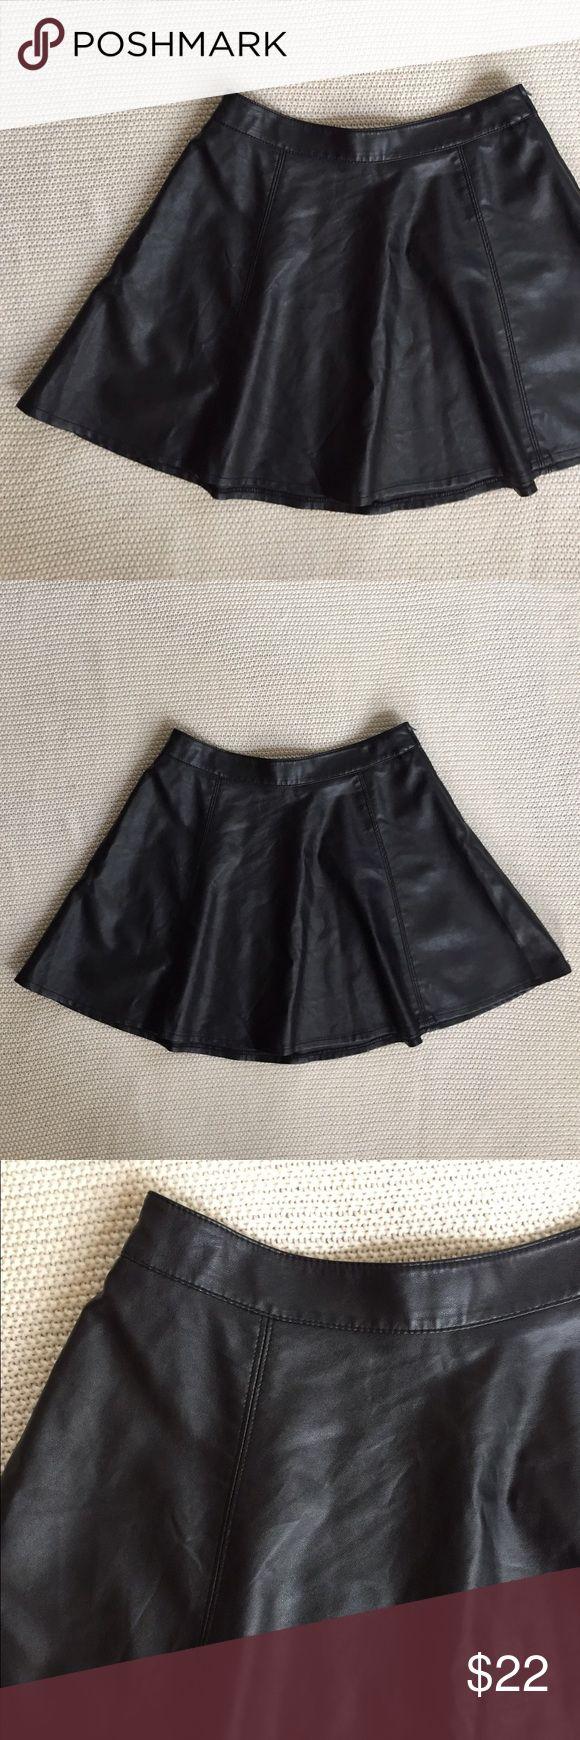 H&M Faux Leather Skirt Black faux leather skater skirt. 52% viscose, 48% polyester, polyurethane coating. H&M Skirts Circle & Skater